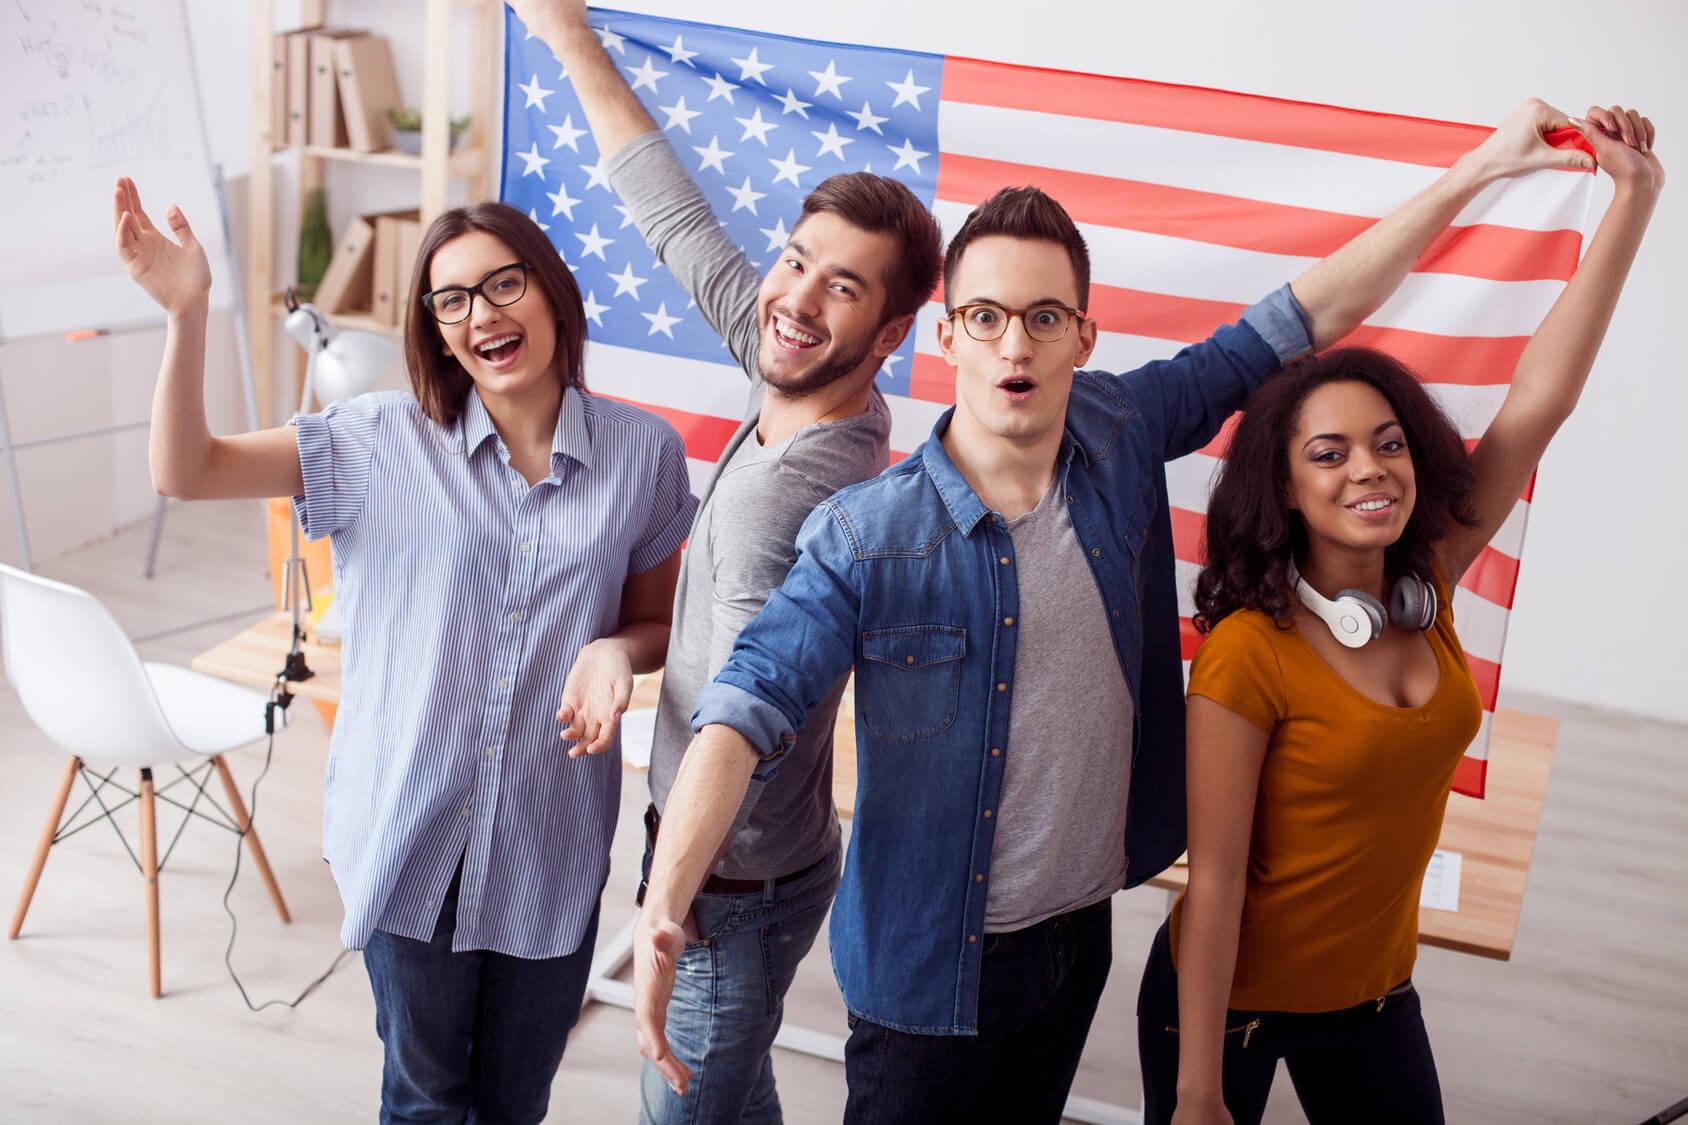 We love the Unites States of America